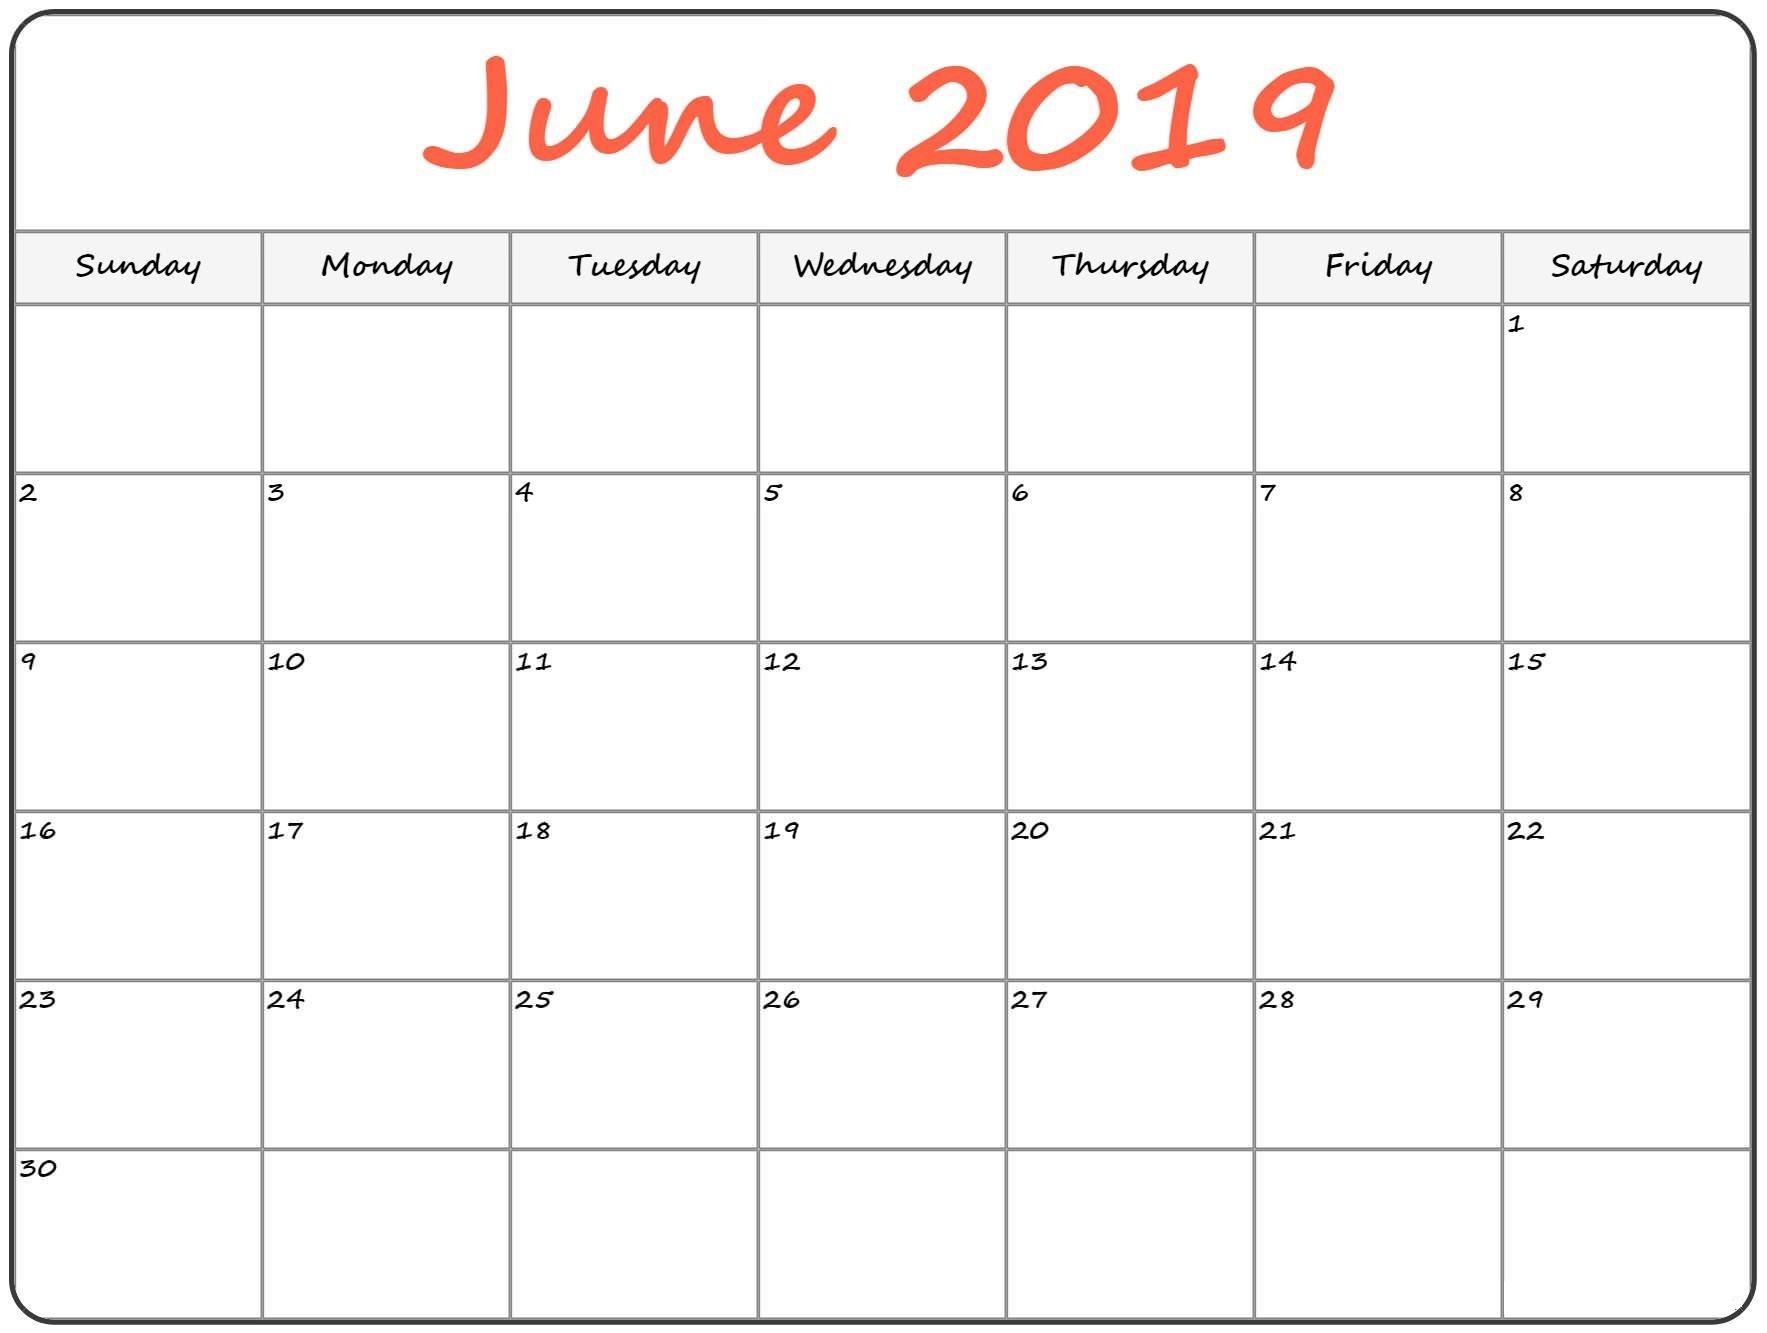 Blank June 2019 Calendar PDF